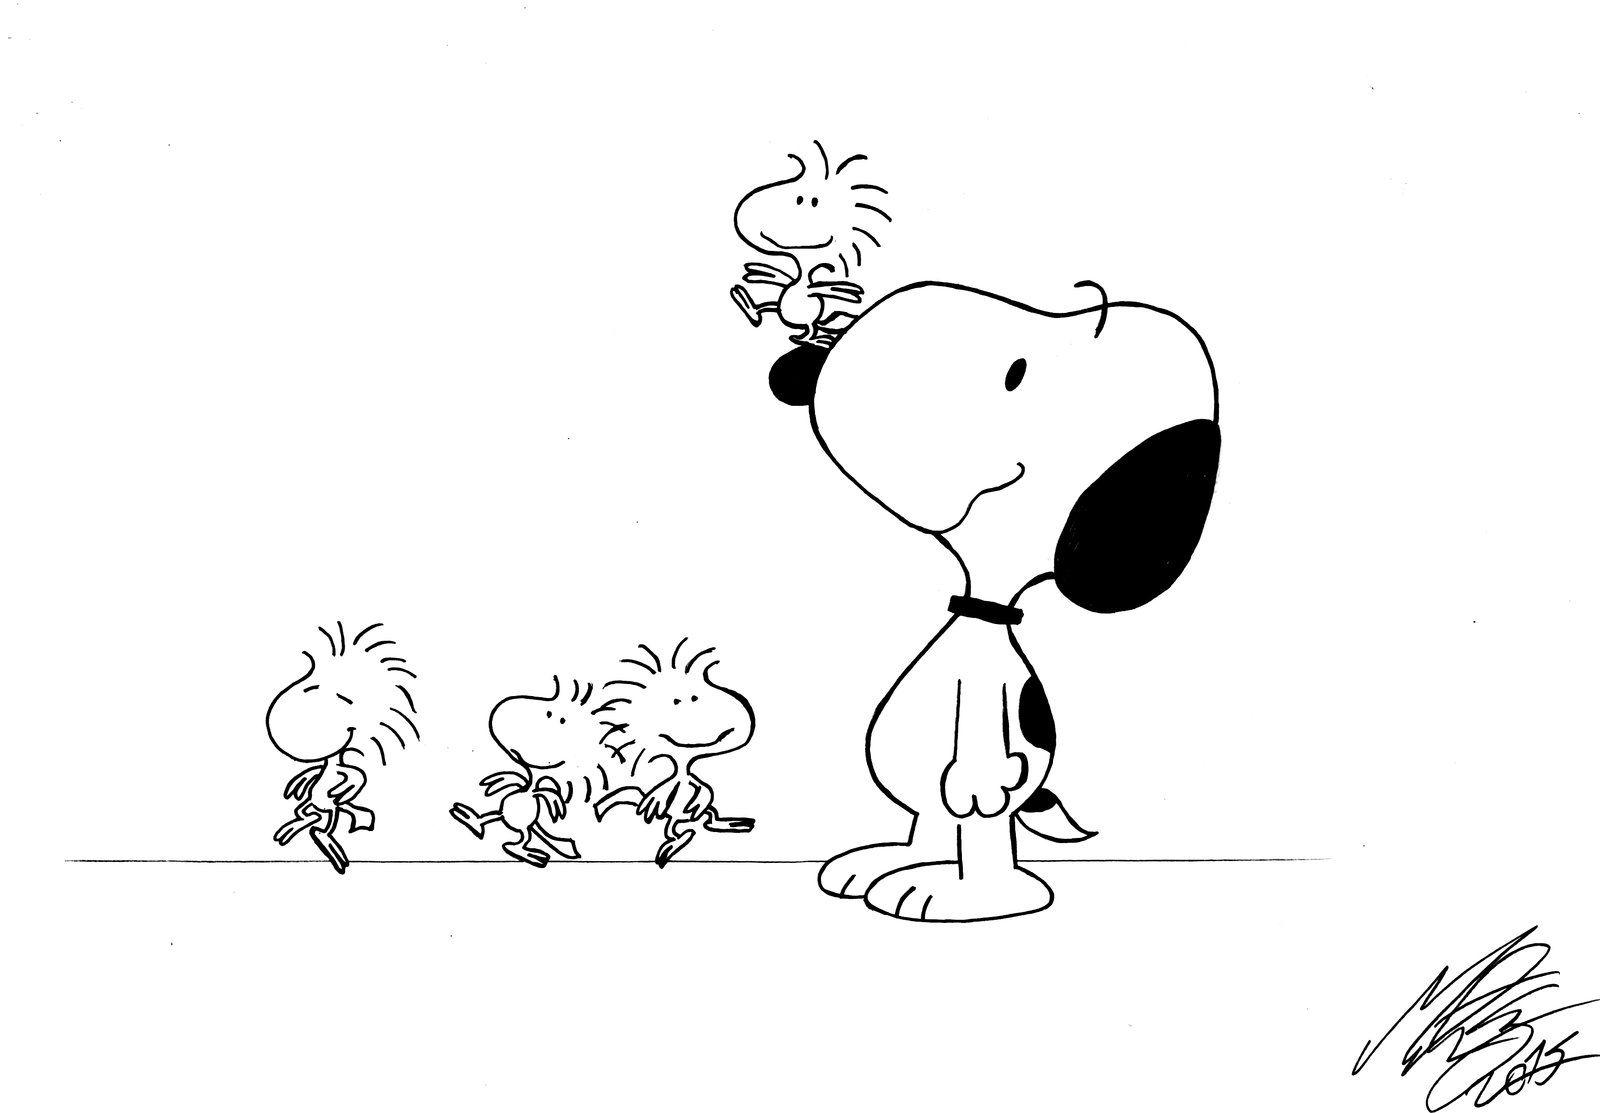 Free Svg Woodstock Snoopy Peanuts Bird Blog Posts Svg The Craft Chop Snoopy Cartoon Snoopy Birthday Woodstock